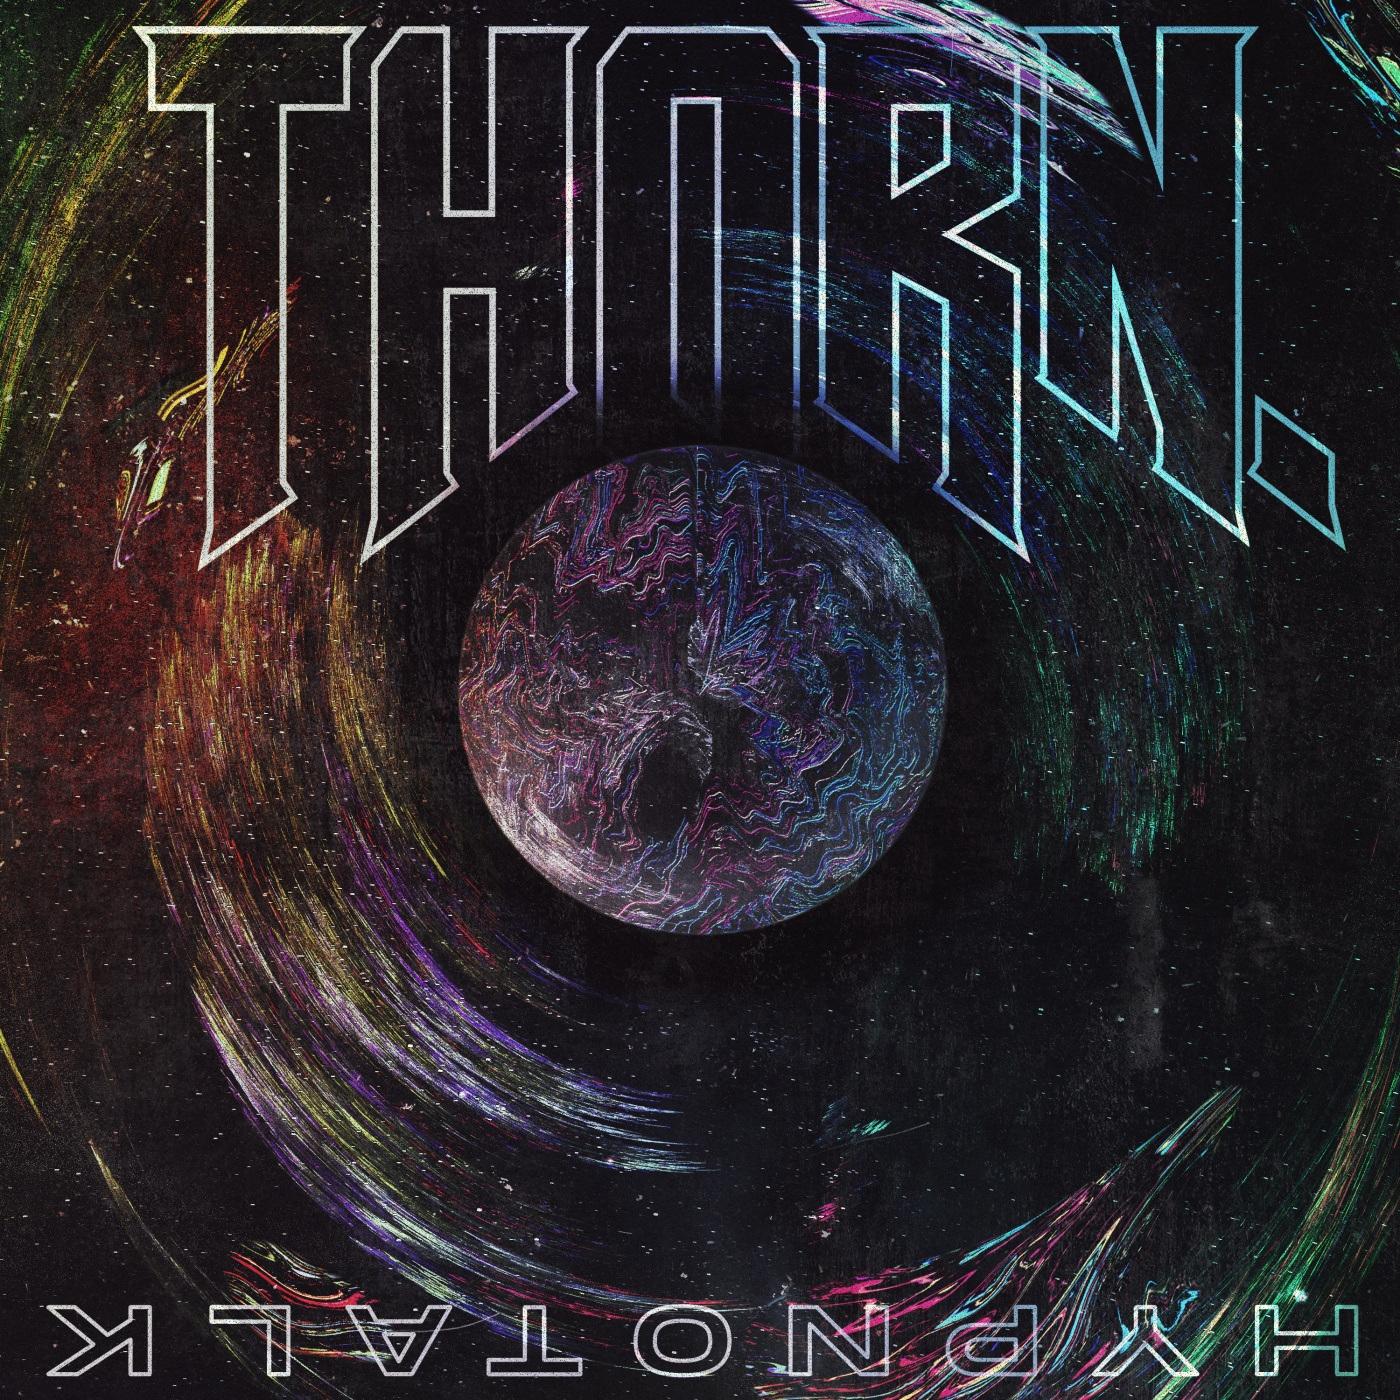 THORN. - Reanimate [single] (2020)